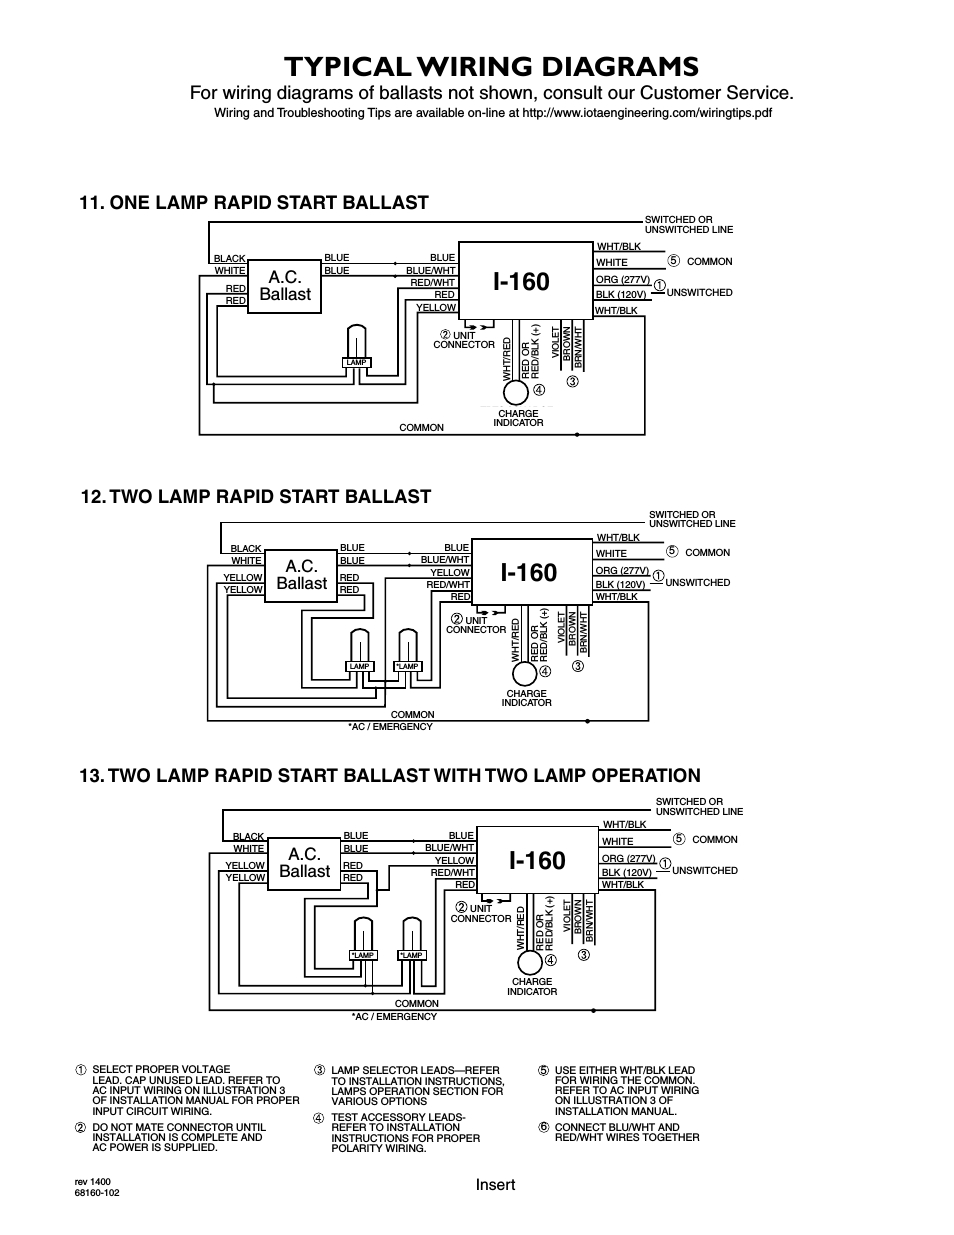 Typical Wiring Diagrams, I-160, A.c. Ballast   Iota I-160 User - Ballast Wiring Diagram